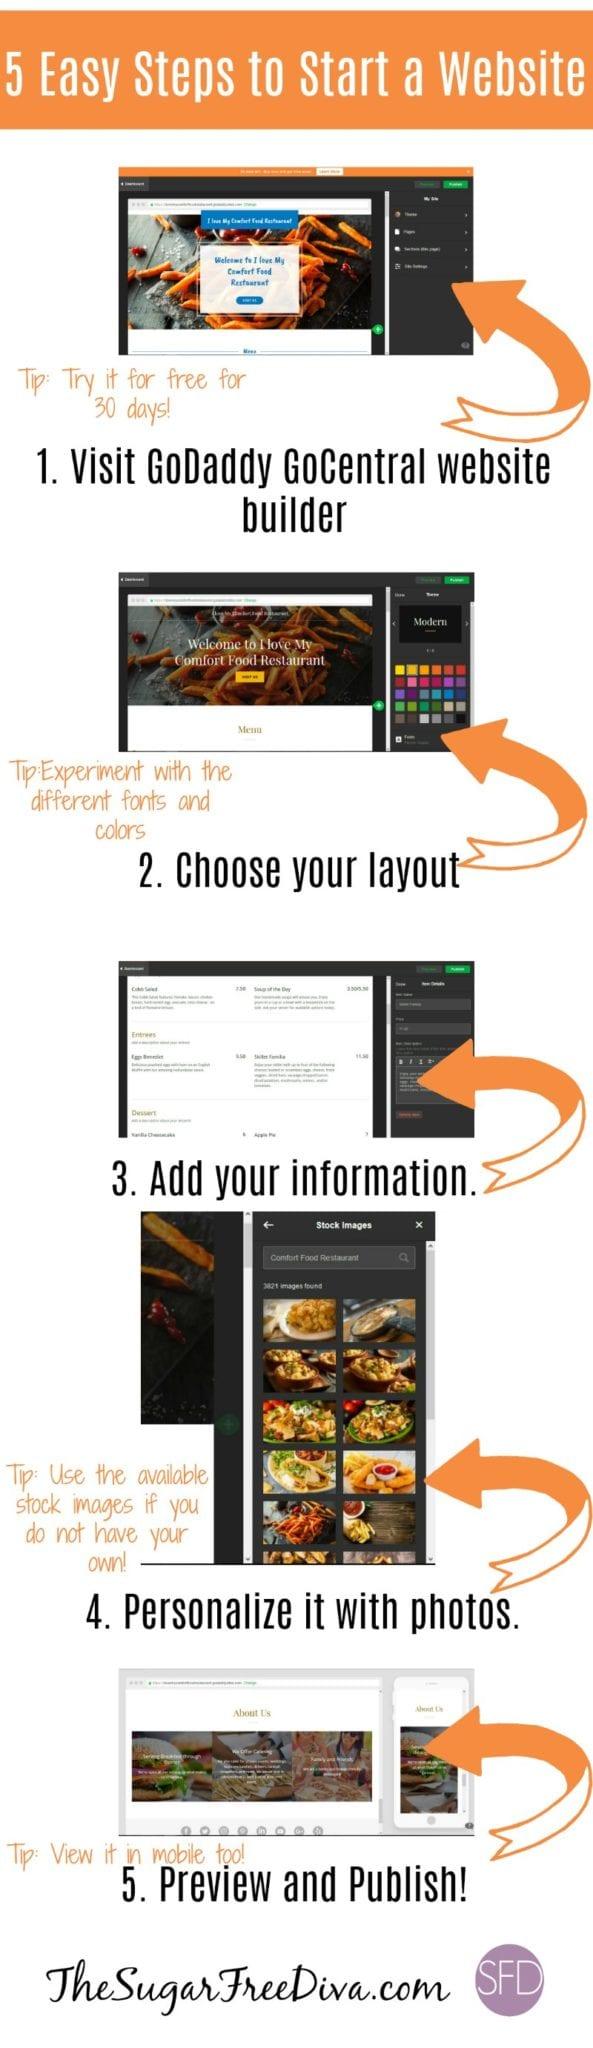 5 Easy Steps to Start a Website